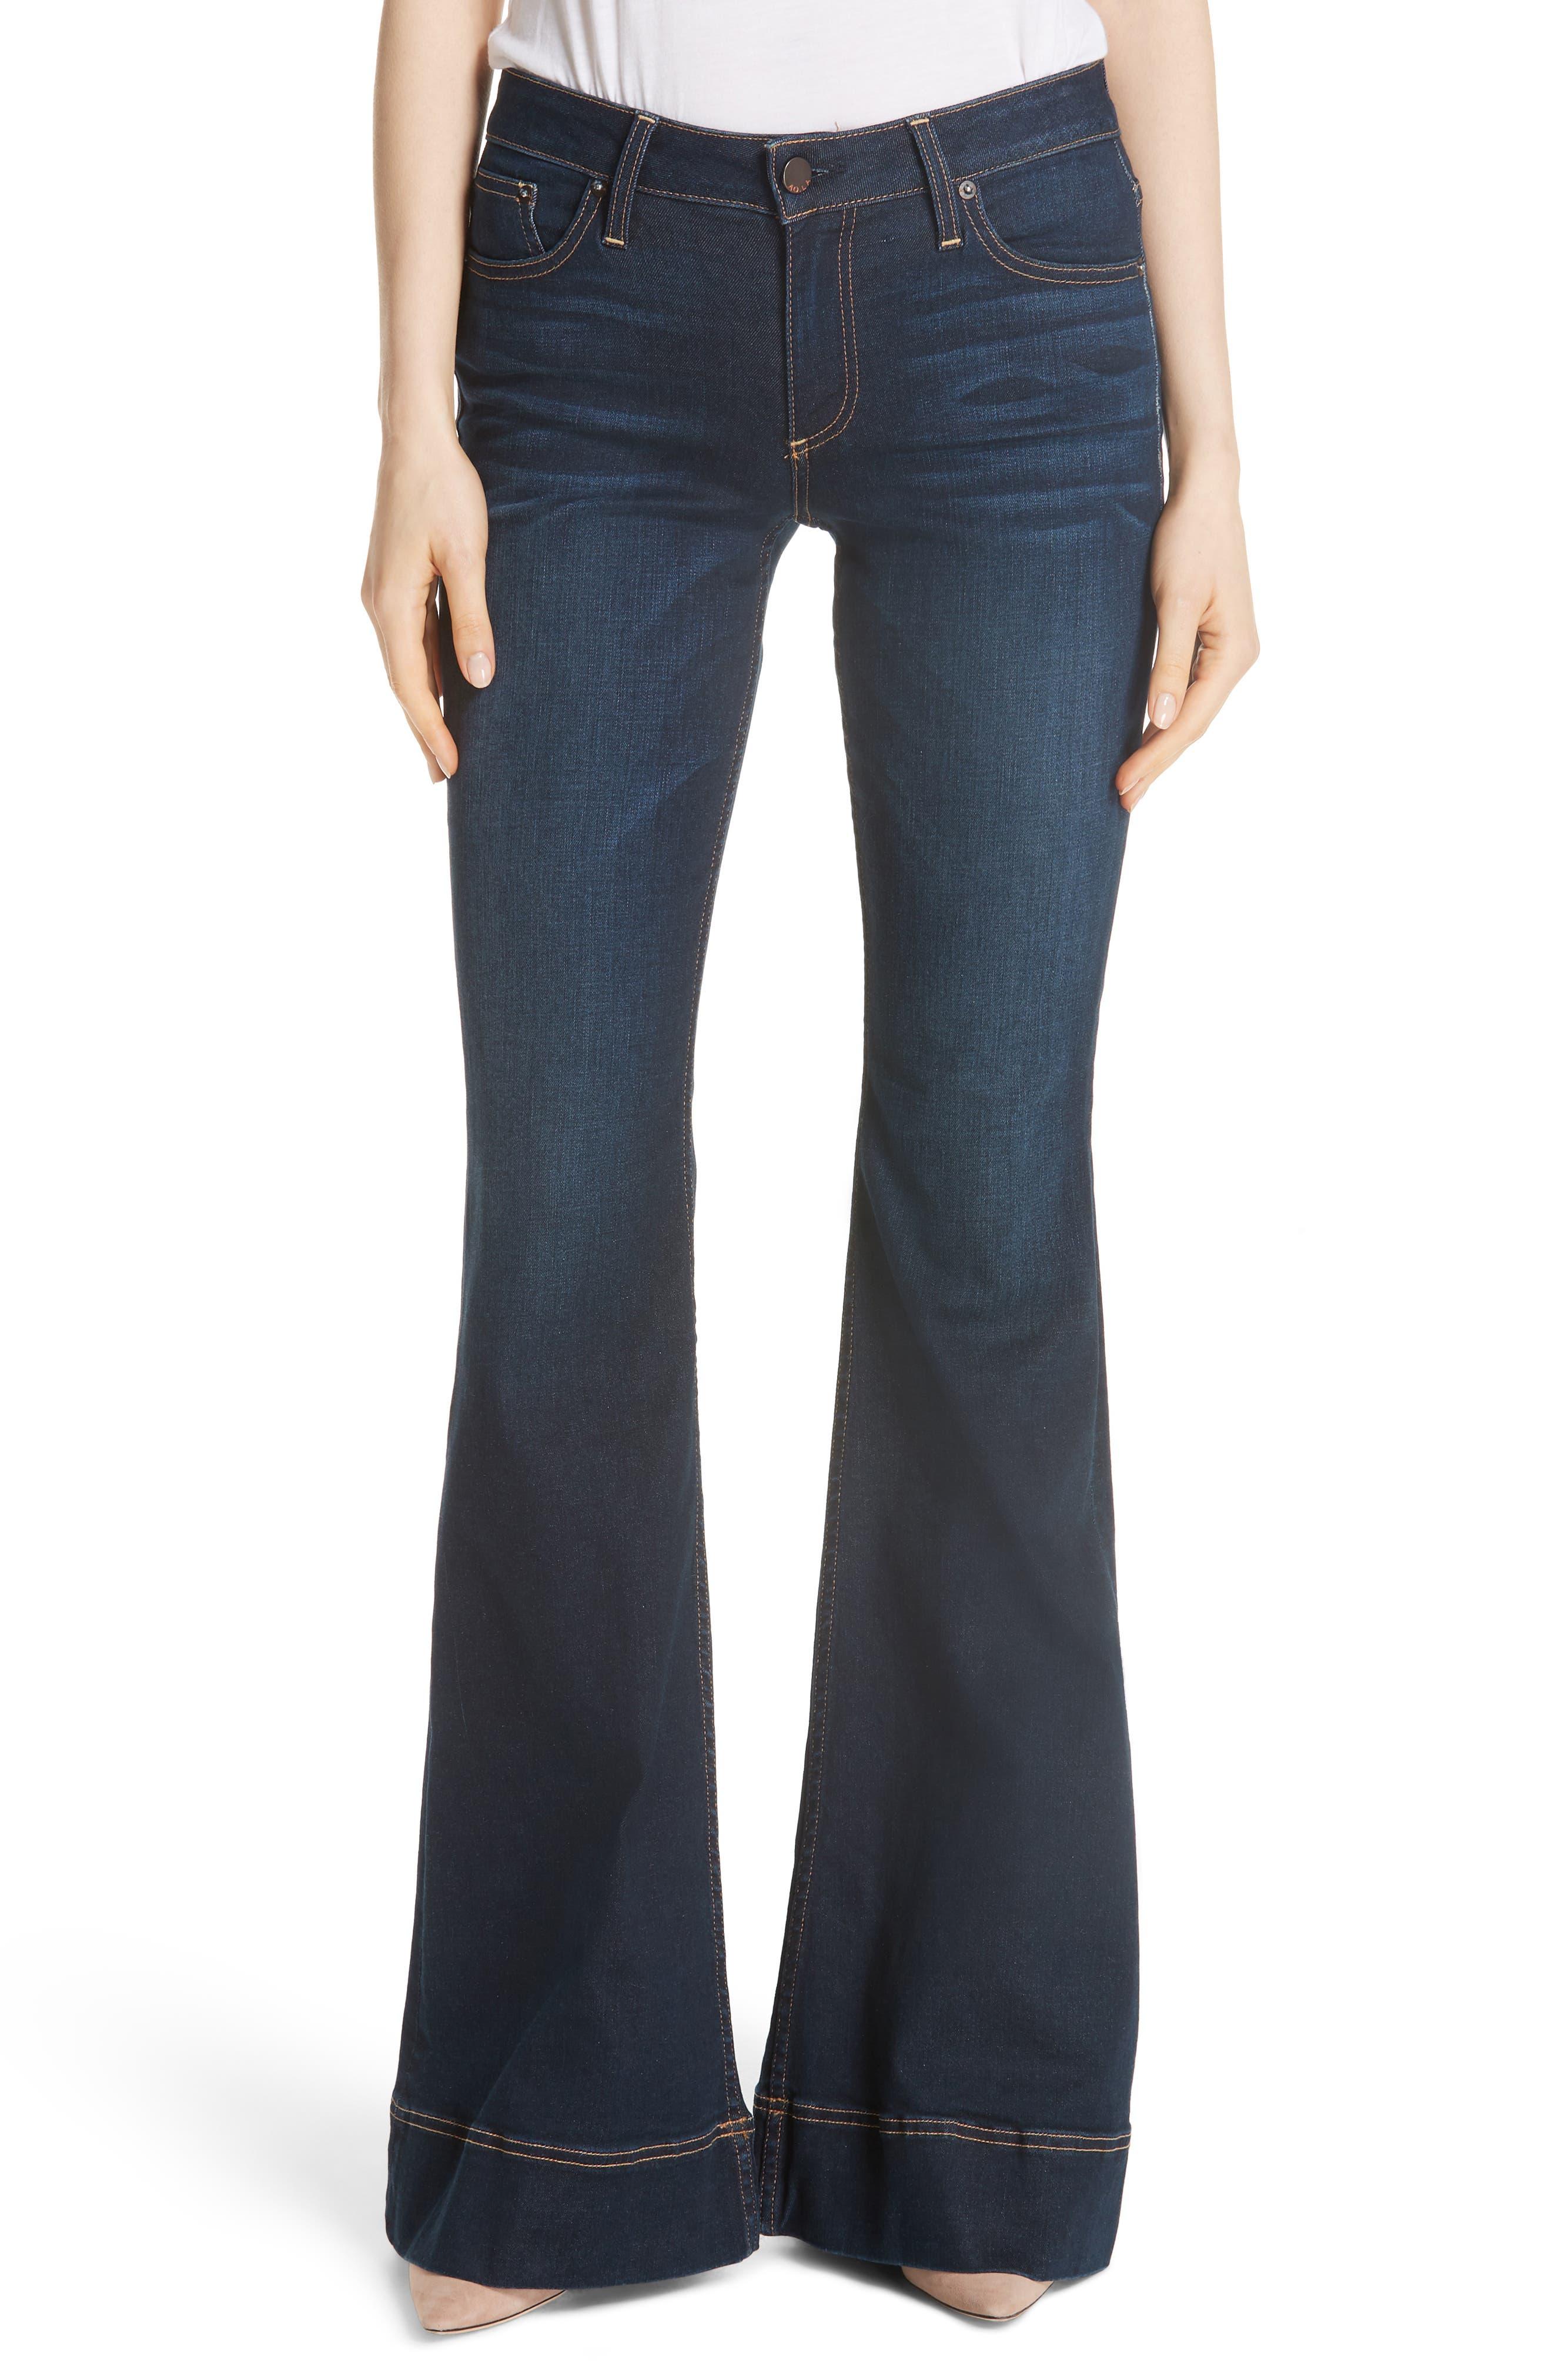 AO.LA Beautiful Bell Bottom Jeans,                         Main,                         color, TRUST ME